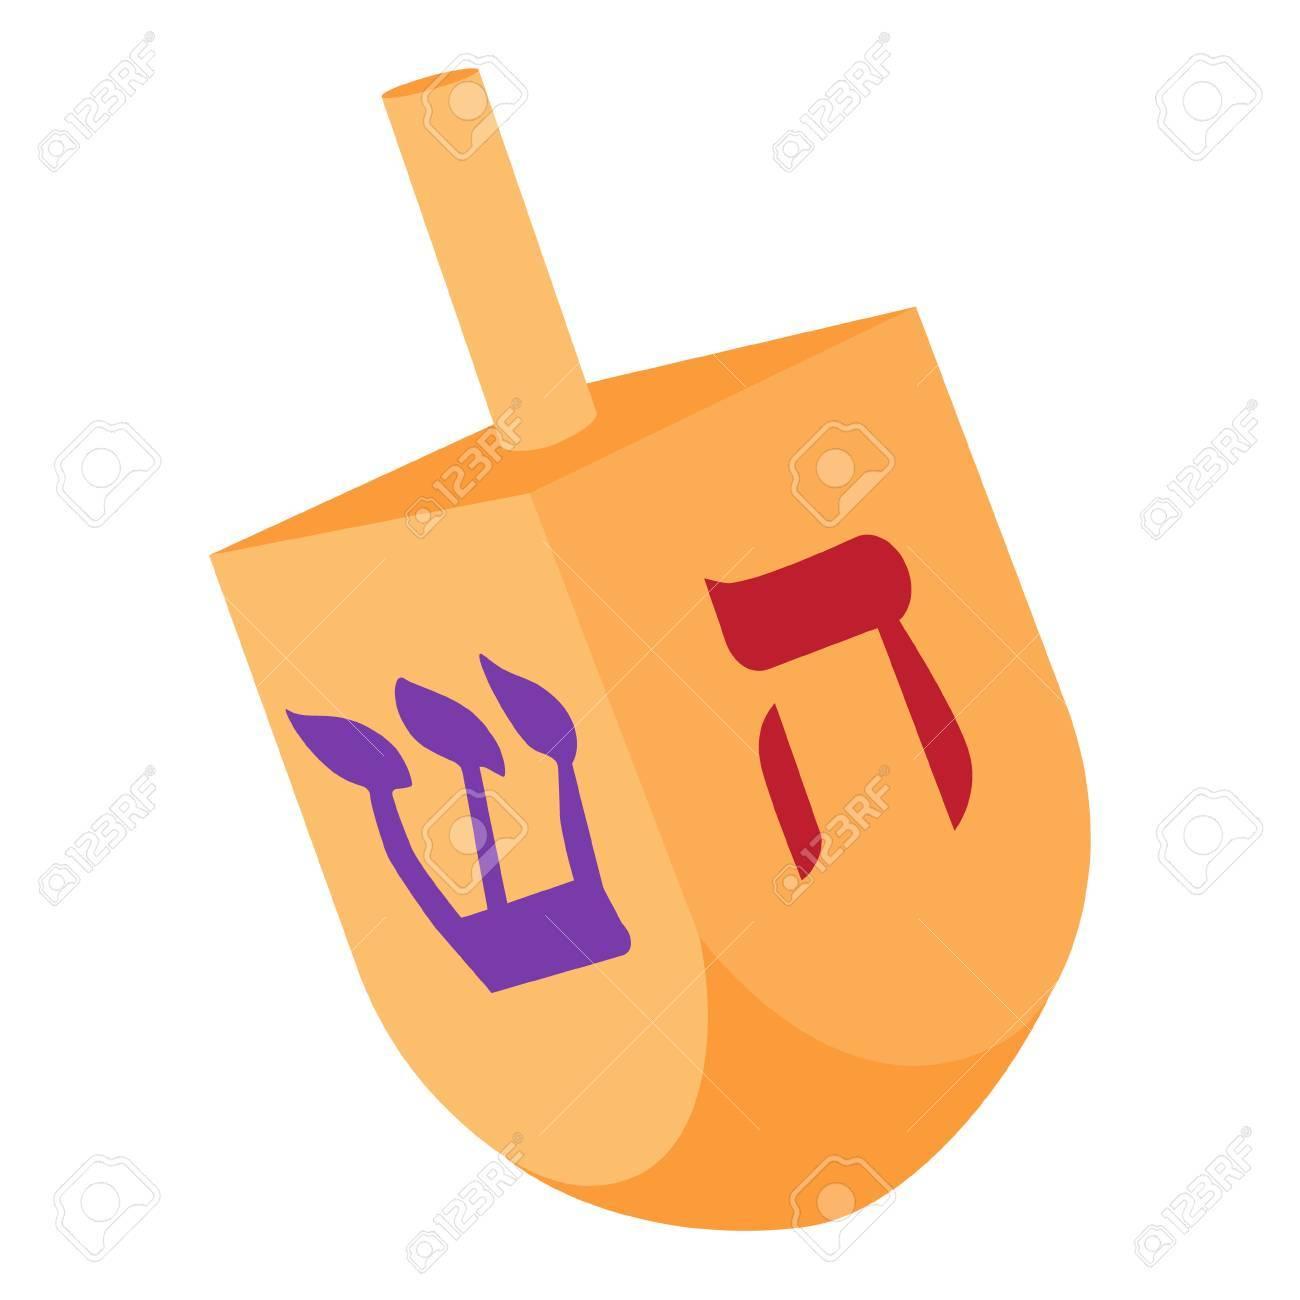 69647165-vector-illustration-of-hanukkah-dreidel-and-its-letters-of-the-hebrew-alphabet-chanuk...jpg